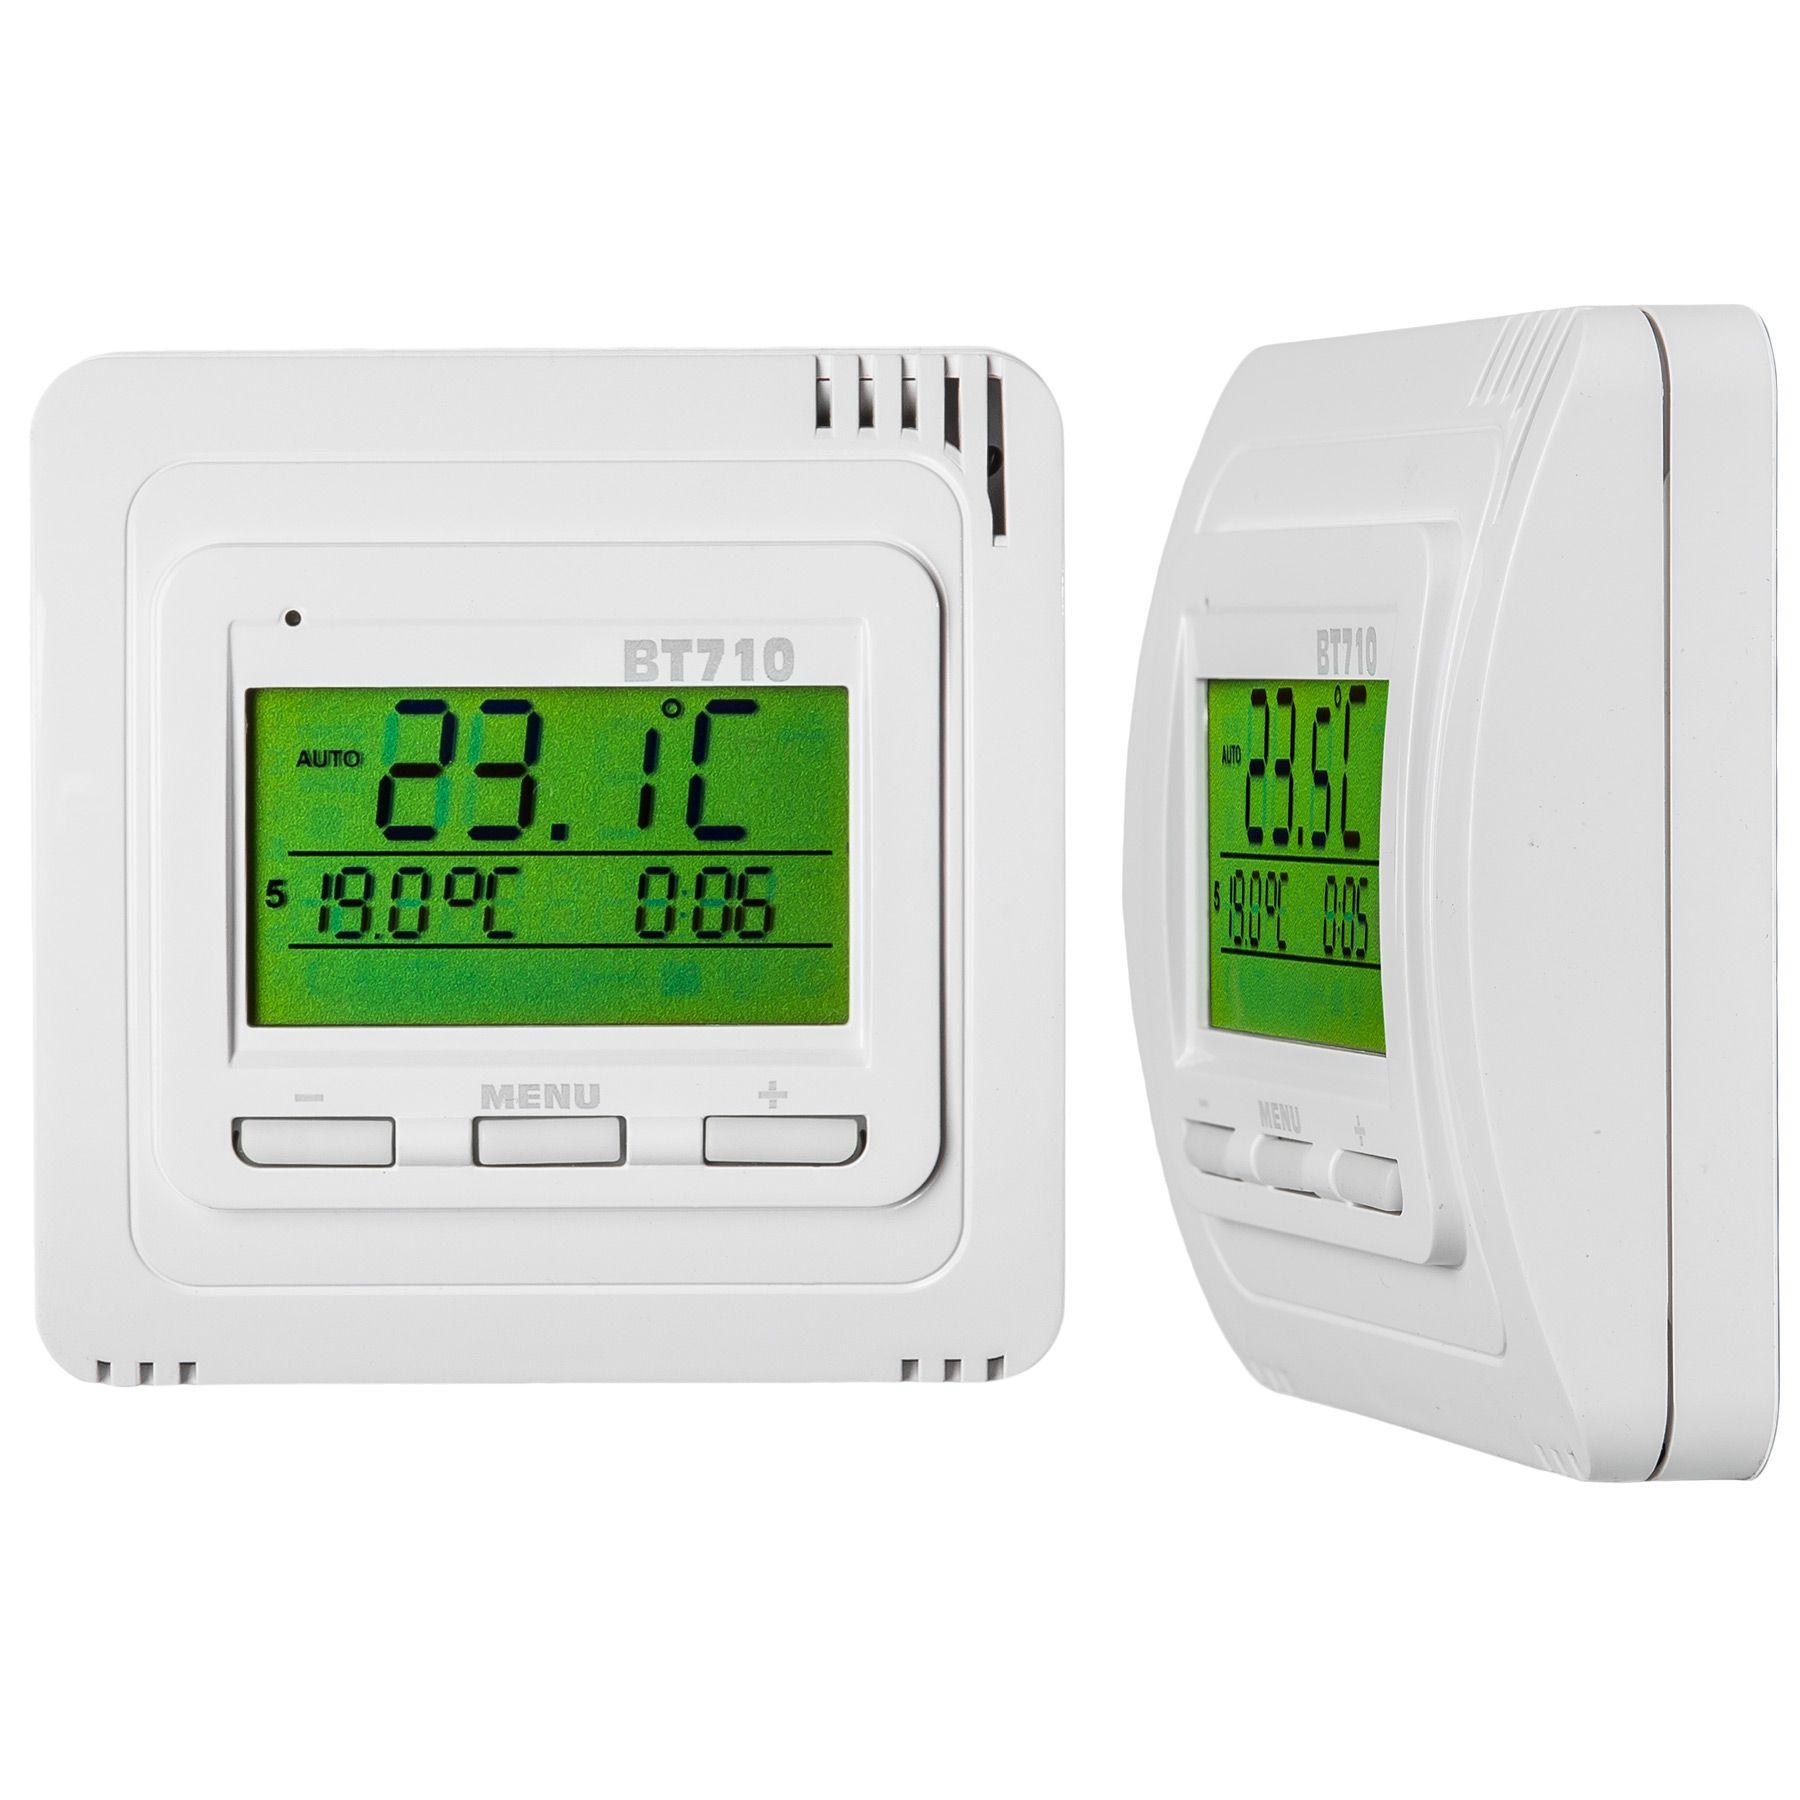 thermostat raumthermostat heizk rper fu bodenheizung digital temperatursensor n 8594012226197 ebay. Black Bedroom Furniture Sets. Home Design Ideas